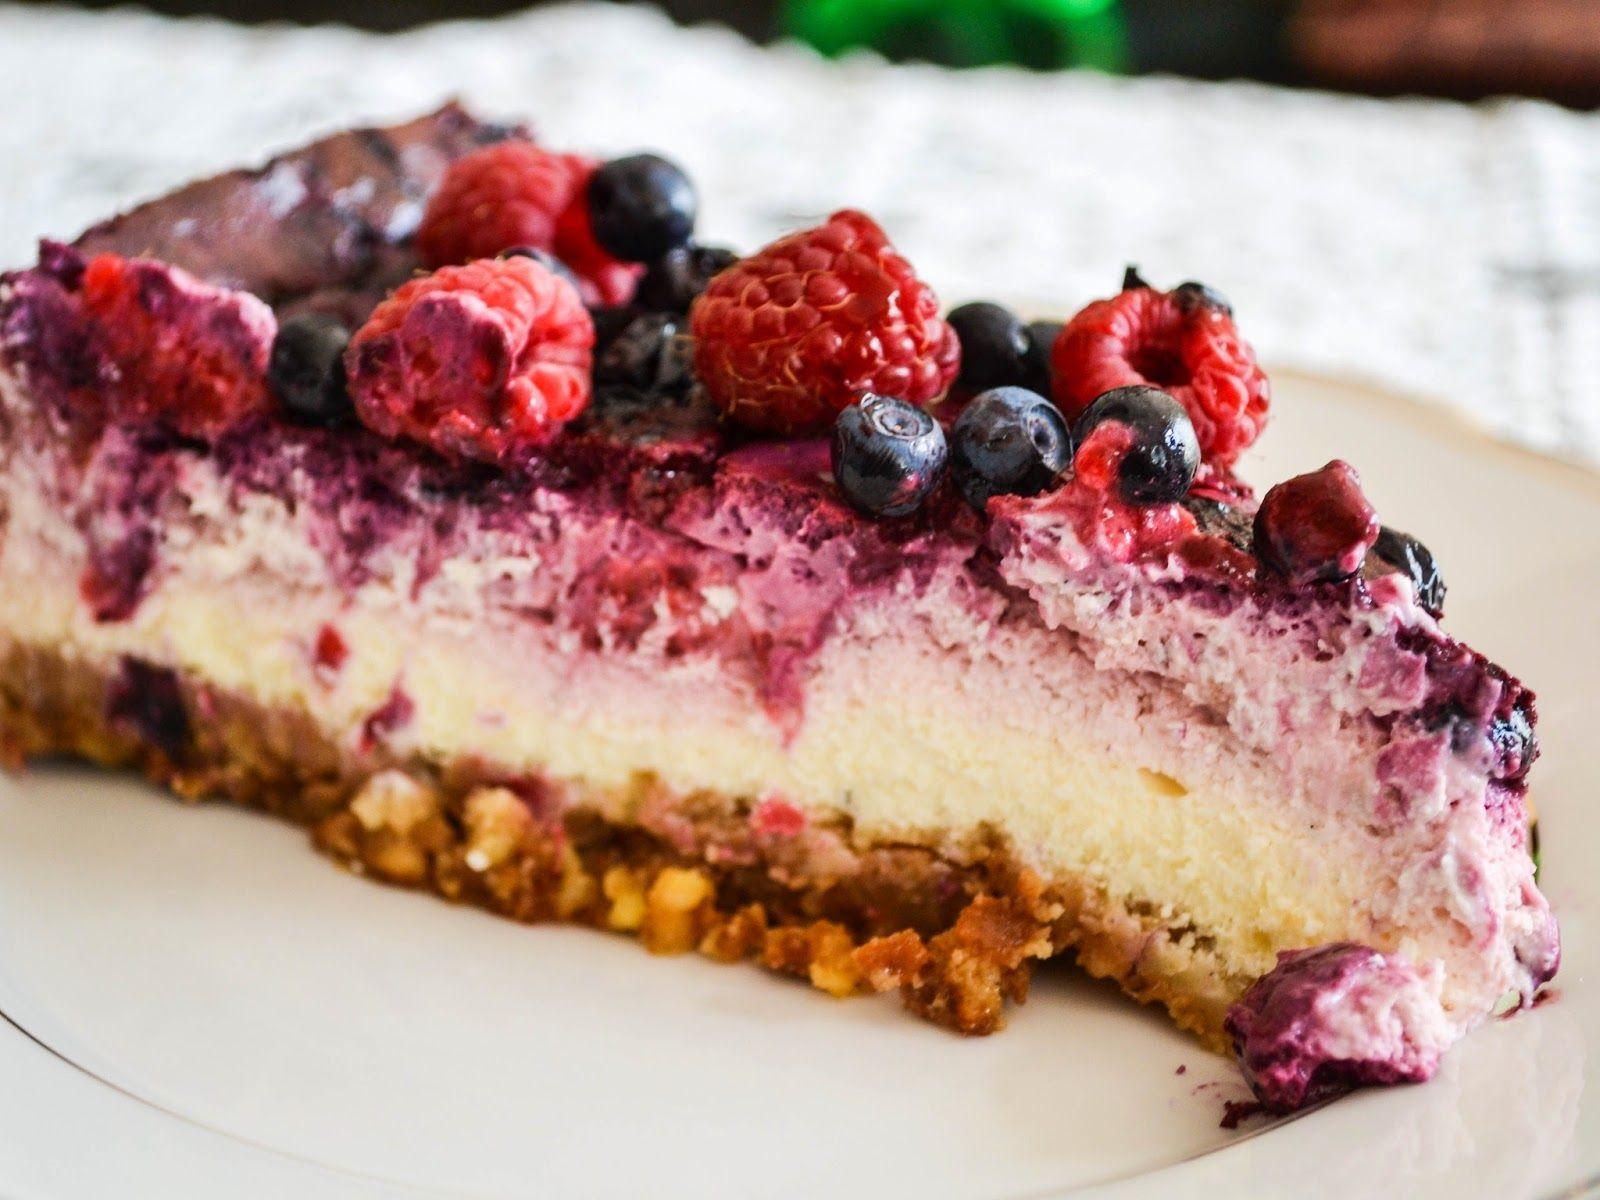 Recipe. Blueberry-raspberry cheesecake